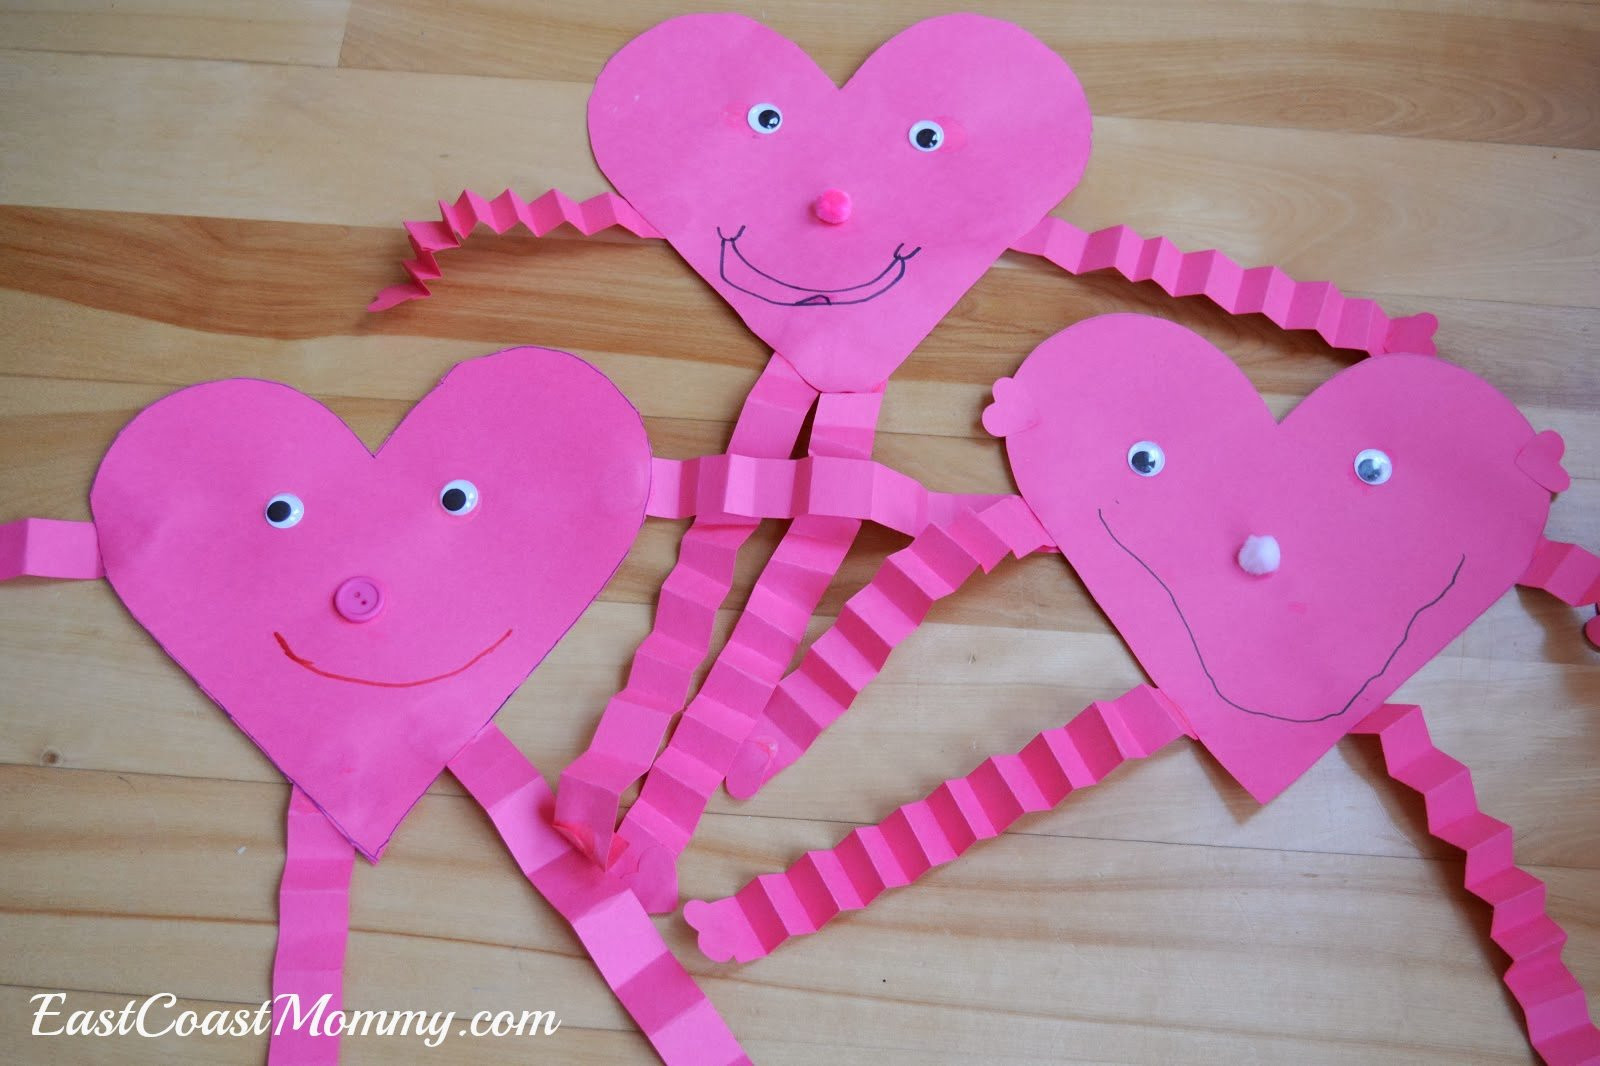 Valentine'S Day Craft Ideas For Preschoolers  12 Easy Valentine Crafts for Toddlers & Preschoolers You